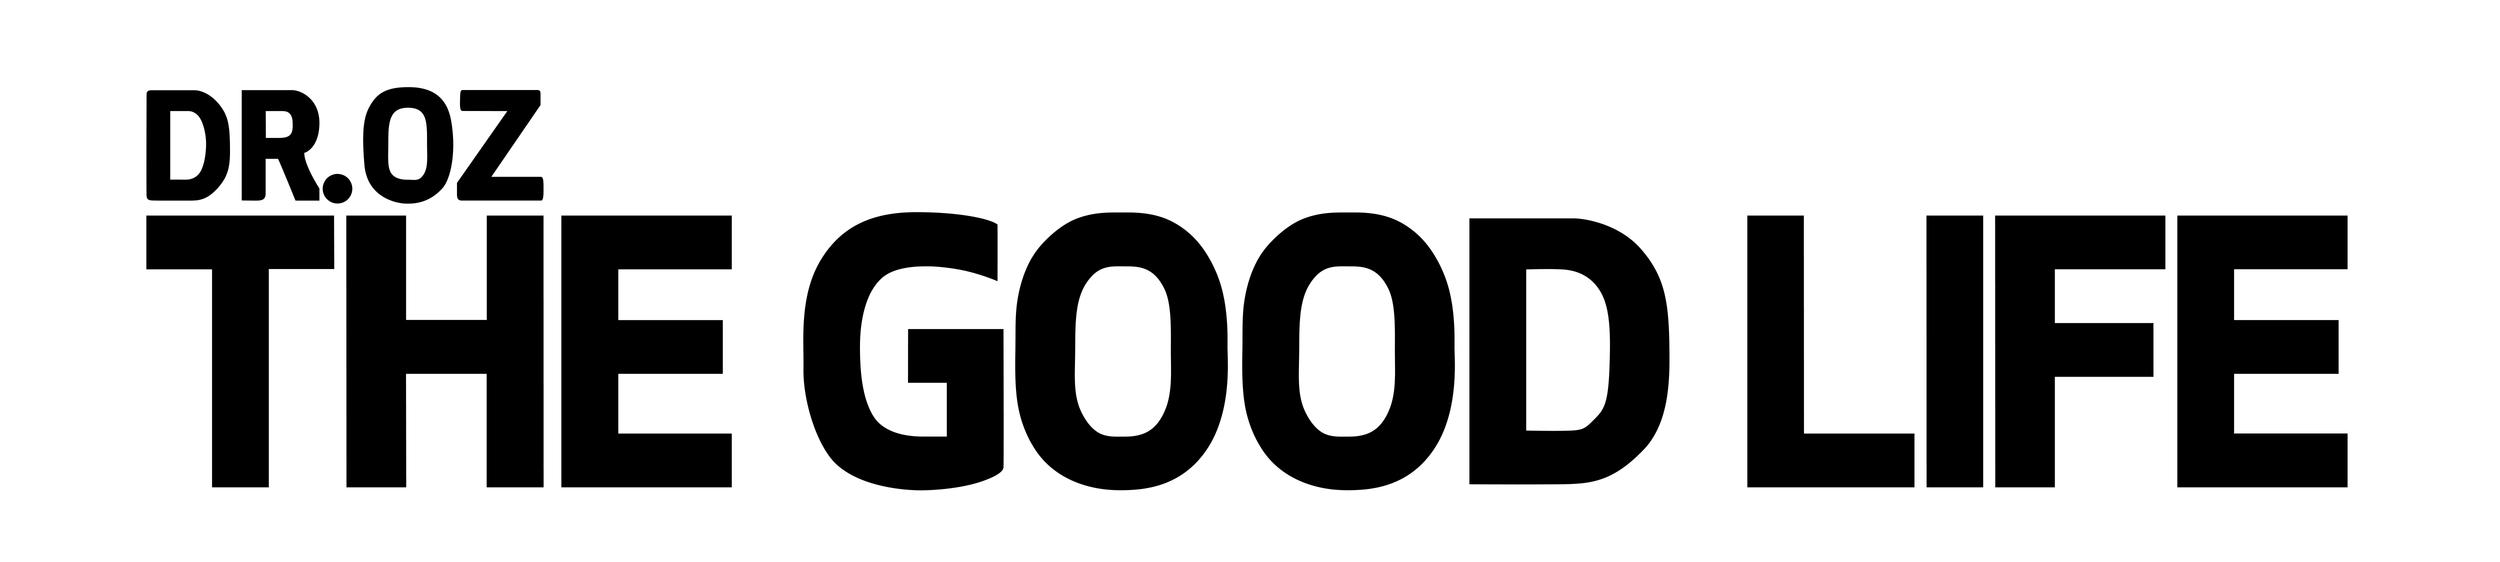 Dr-Oz-The-Good-Life-logo.png